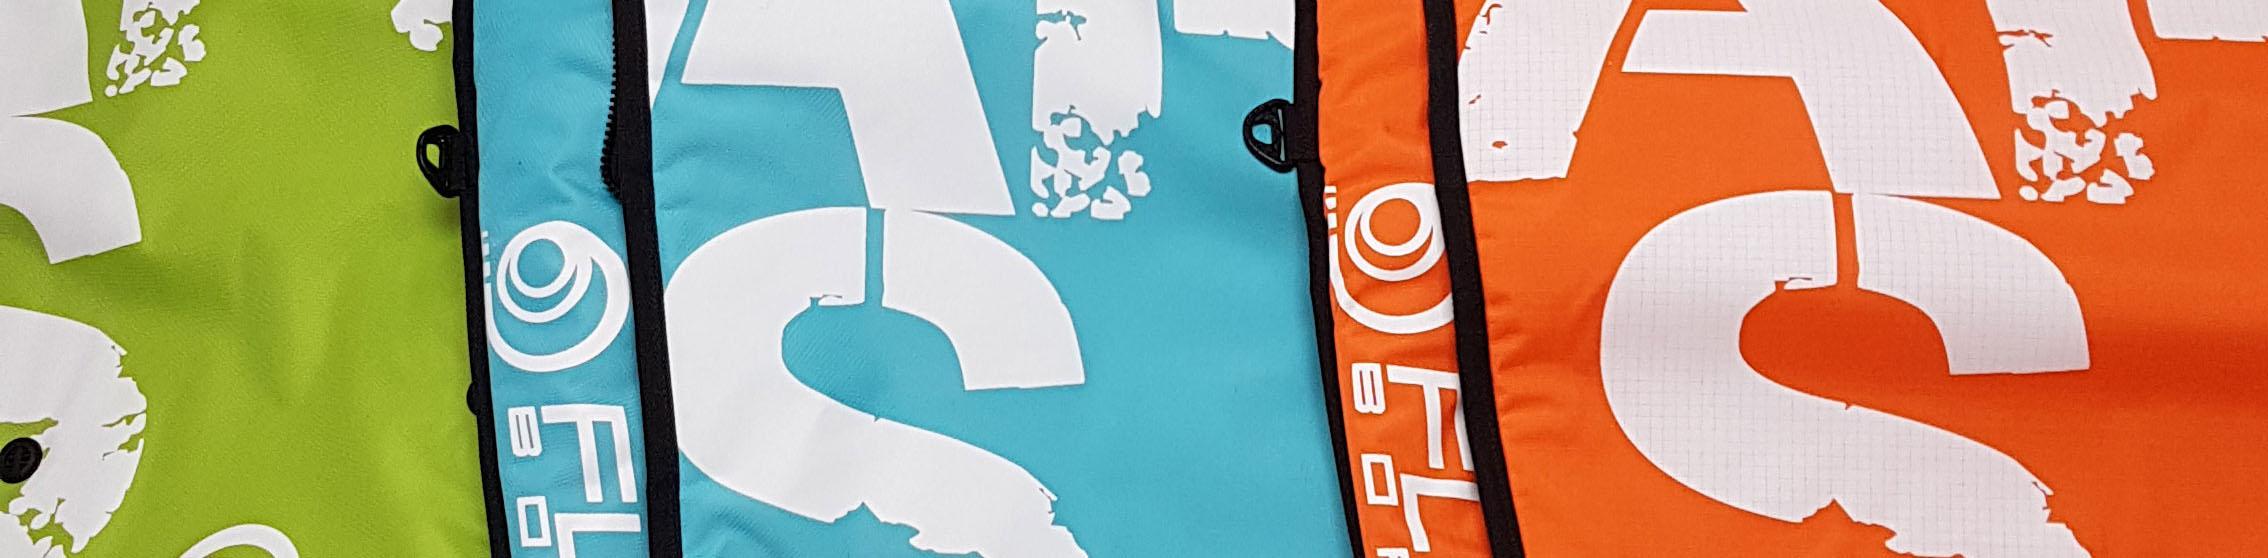 Board-bag-Flikka-boards-general-banner